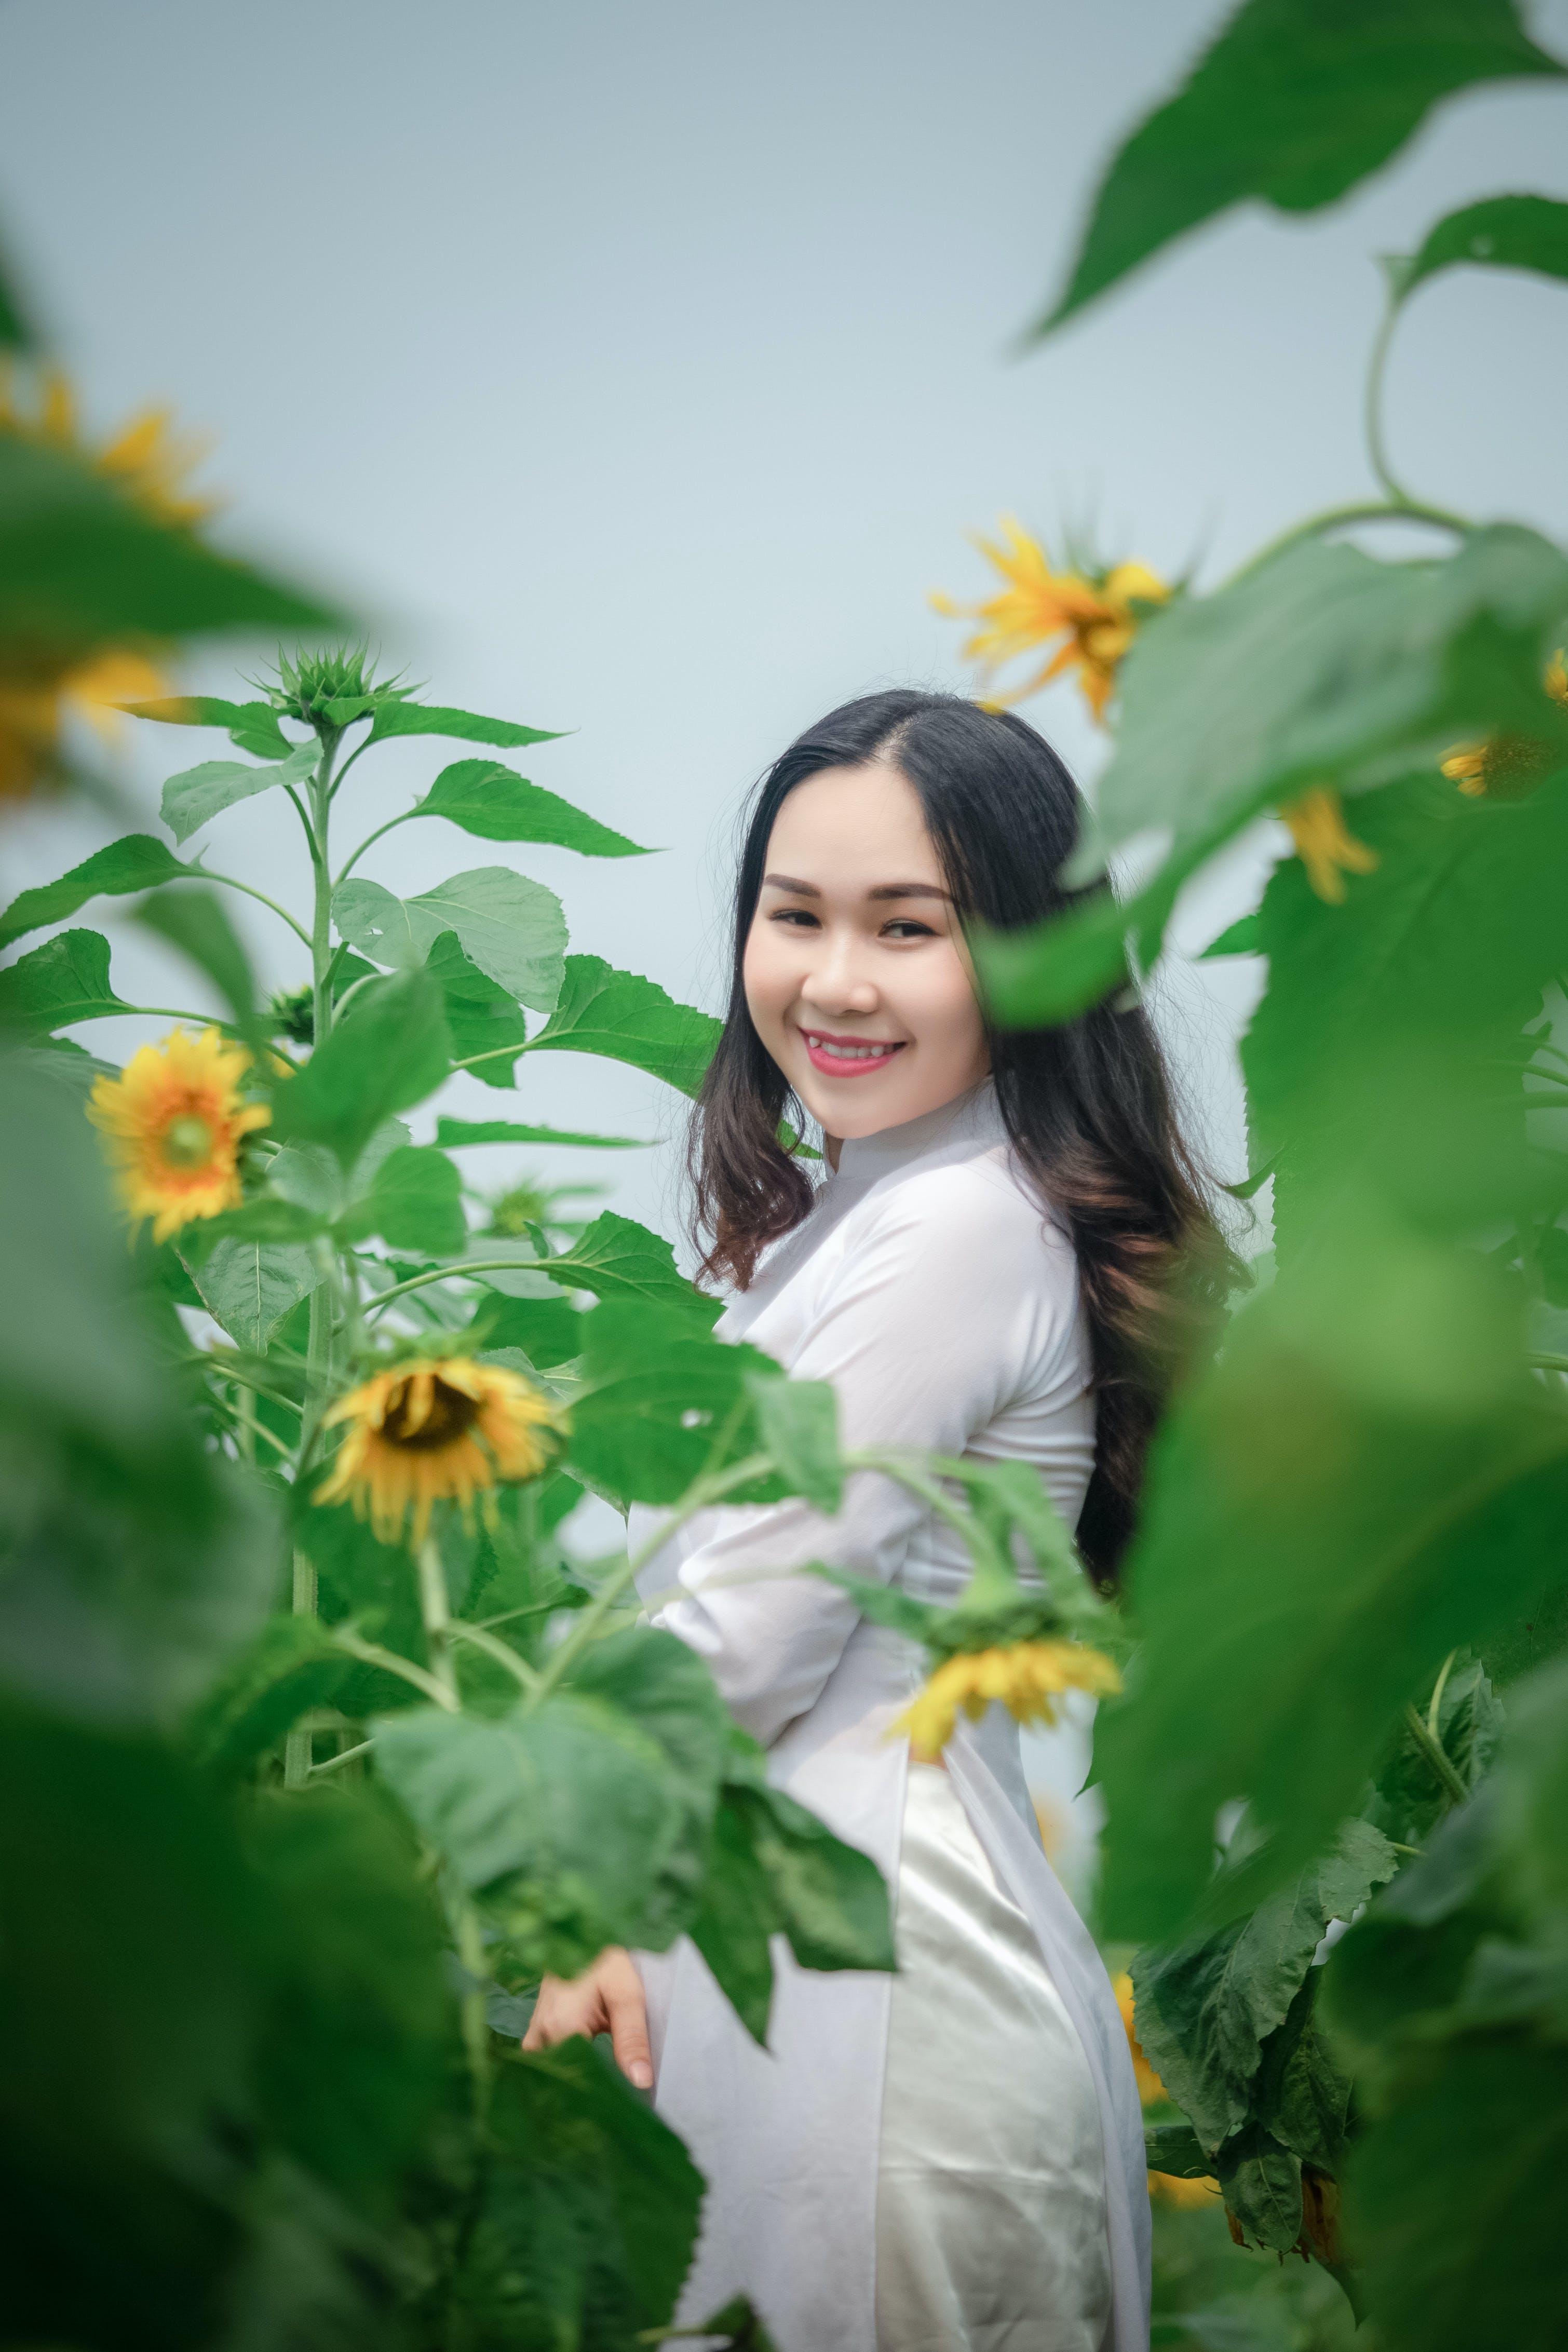 Woman in White Dress Standing on Sunflower Field